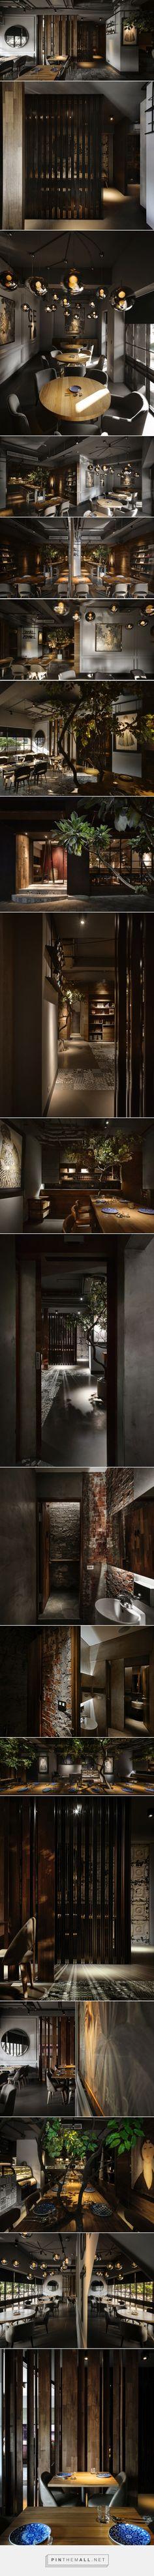 Дизайн интерьера бара-ресторана на Тайване - created via https://pinthemall.net